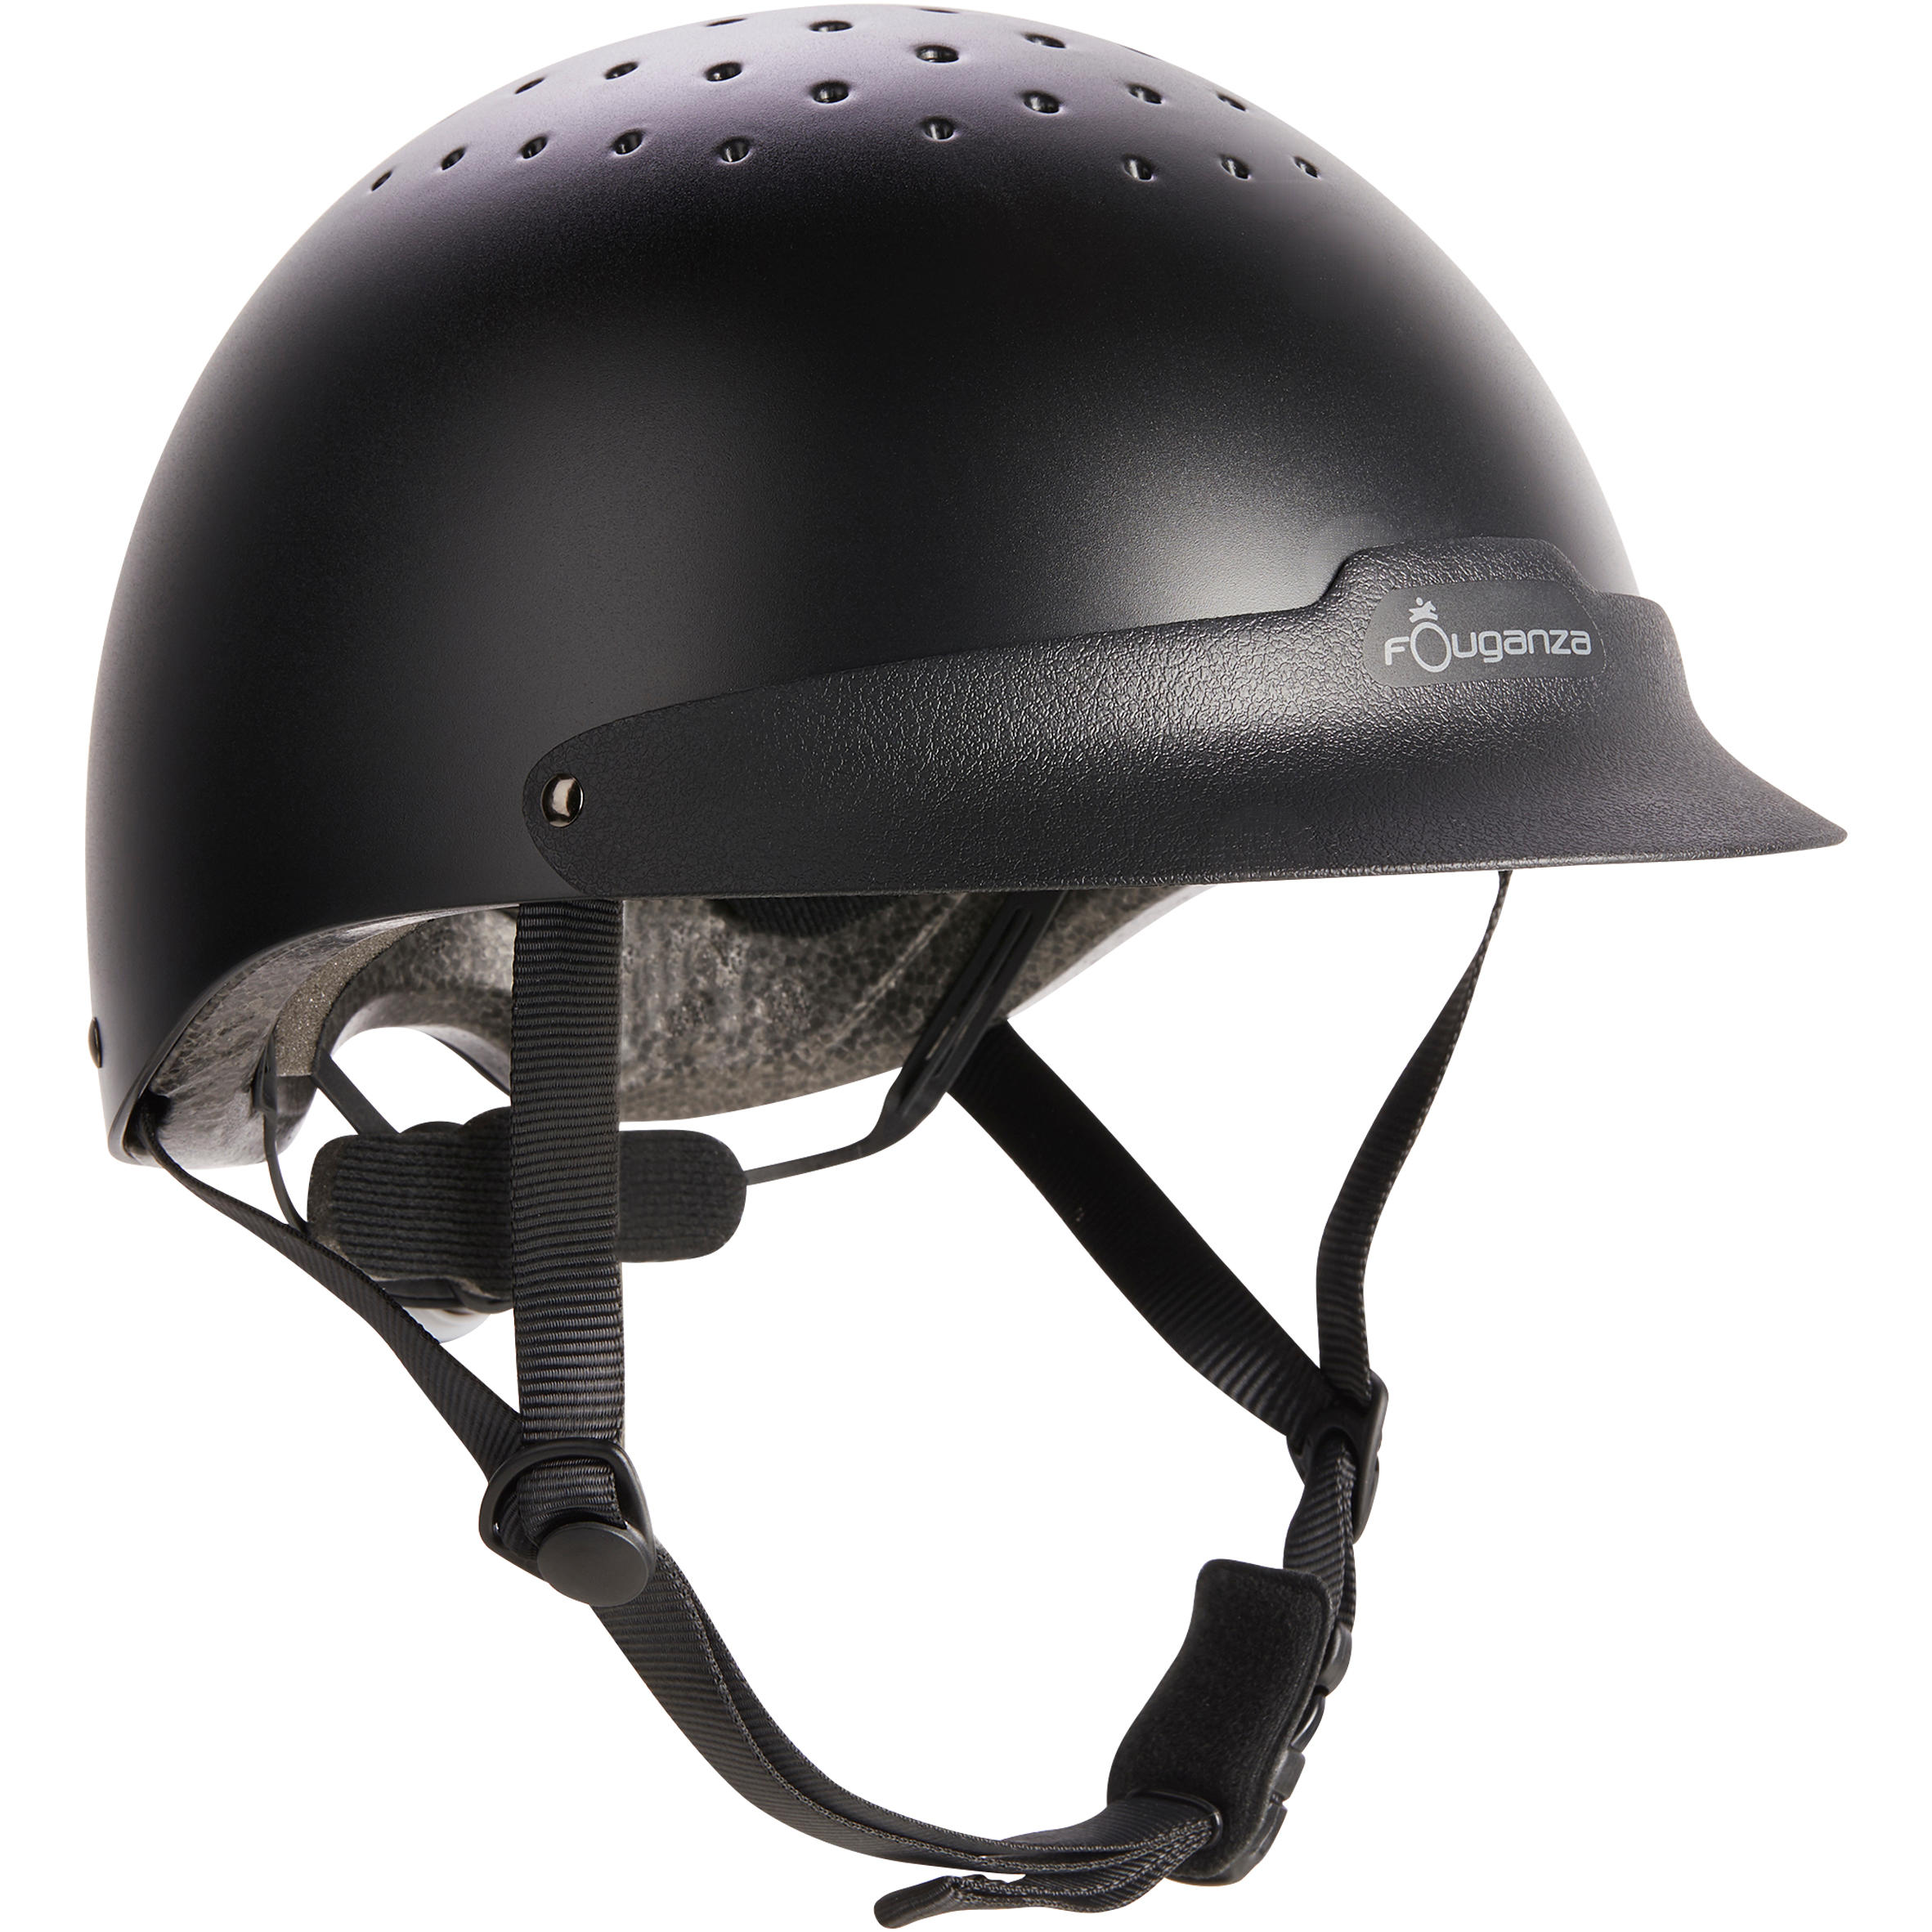 100 Horse Riding Helmet - Black